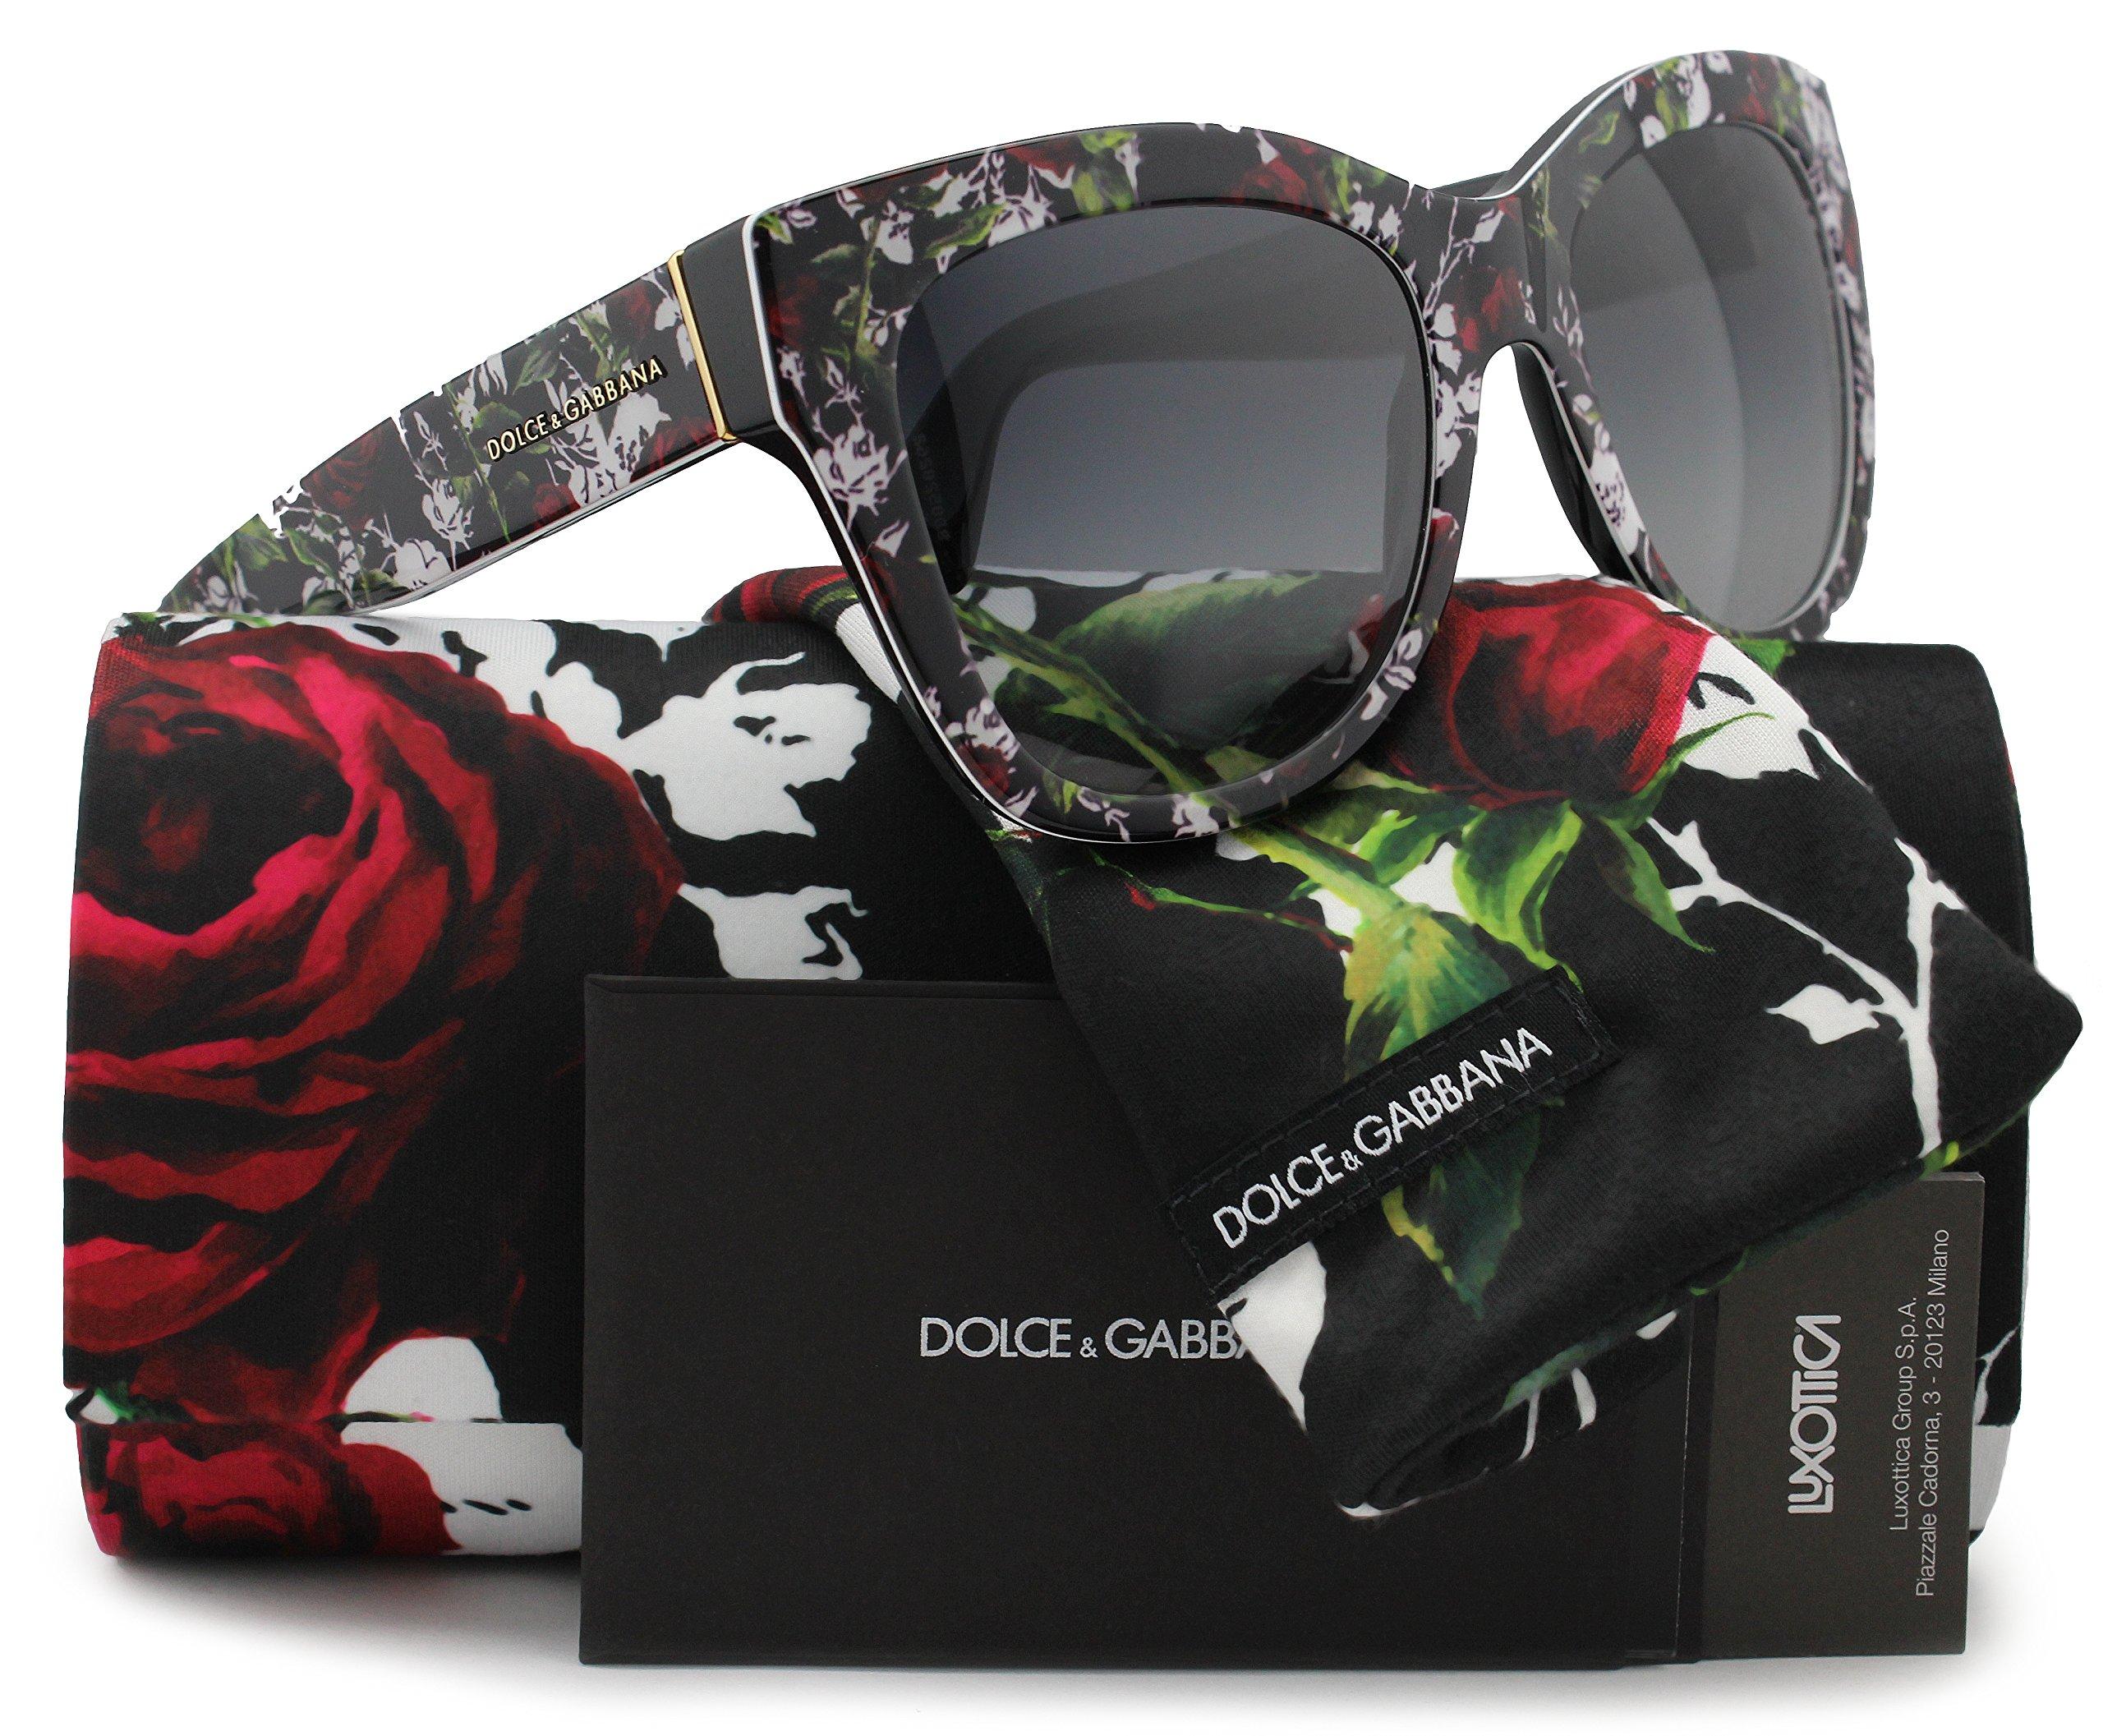 Dolce & Gabbana DG4270 Sunglasses Top Print Rose/Black w/Grey Gradient (3019/8G) DG 4270 30198G 55mm Authentic